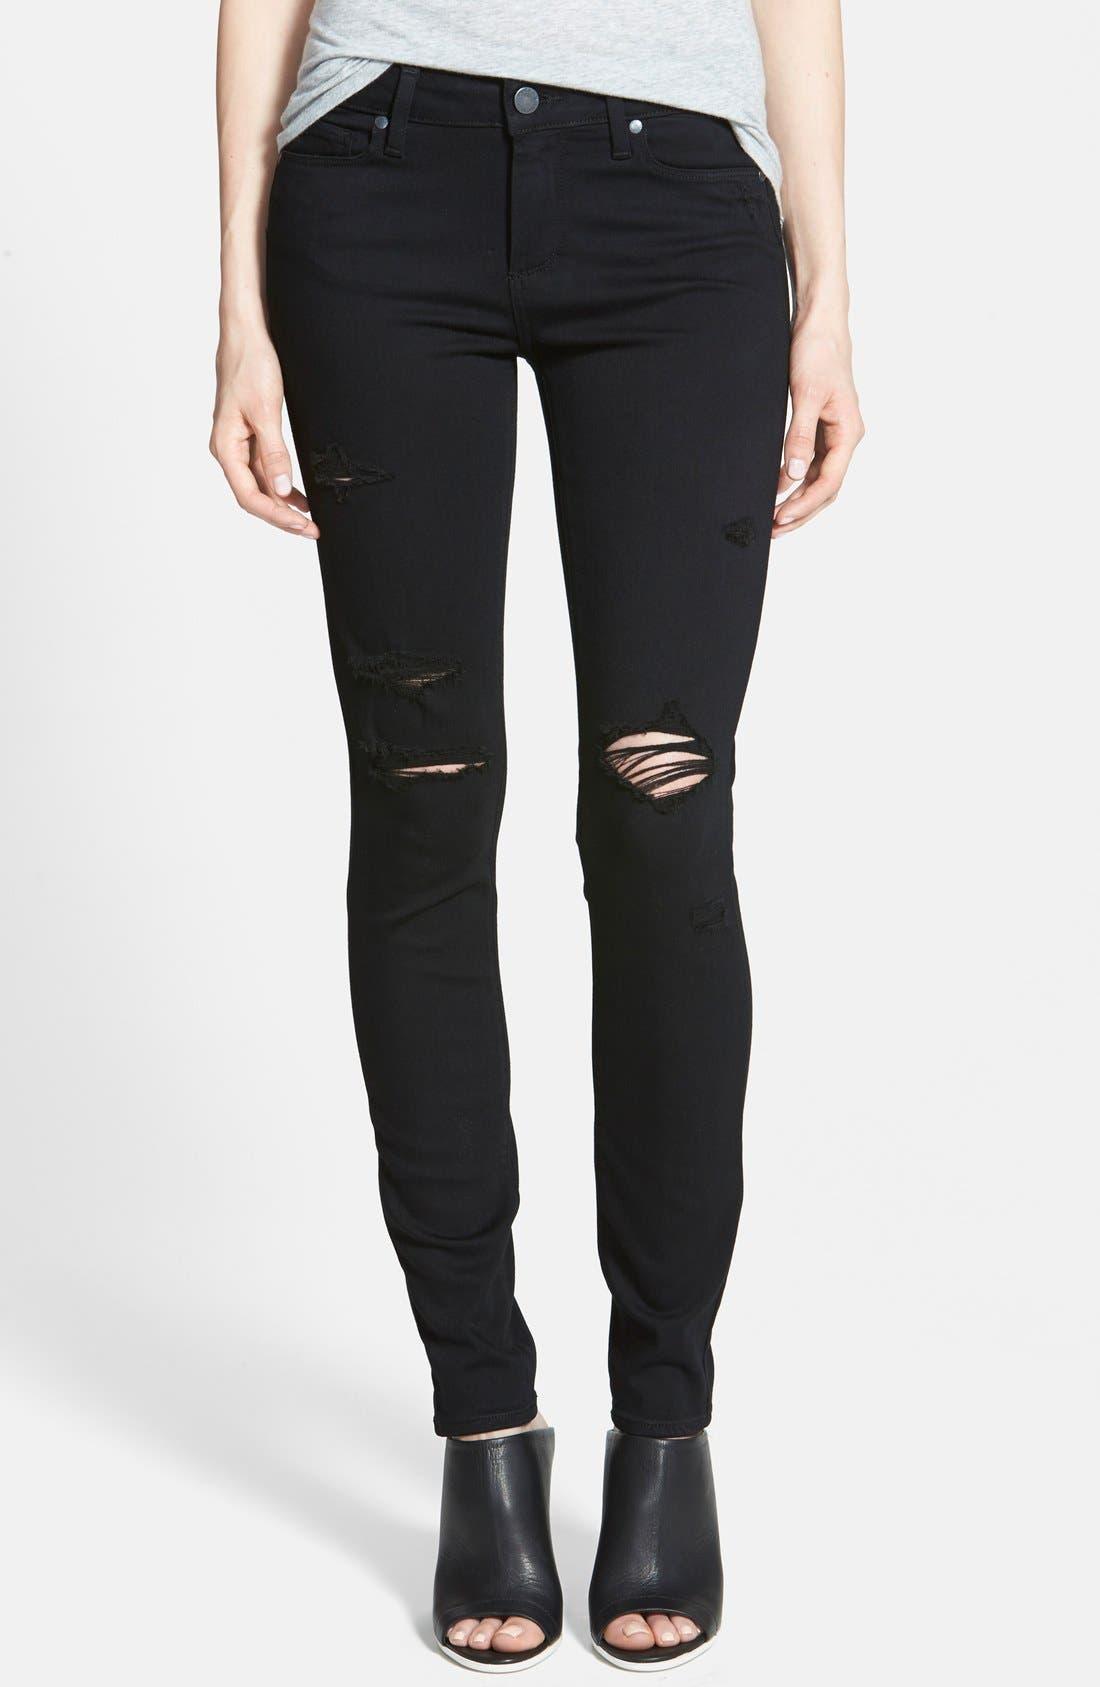 Transcend - Verdugo Ultra Skinny Jeans,                             Main thumbnail 1, color,                             Black Destructed